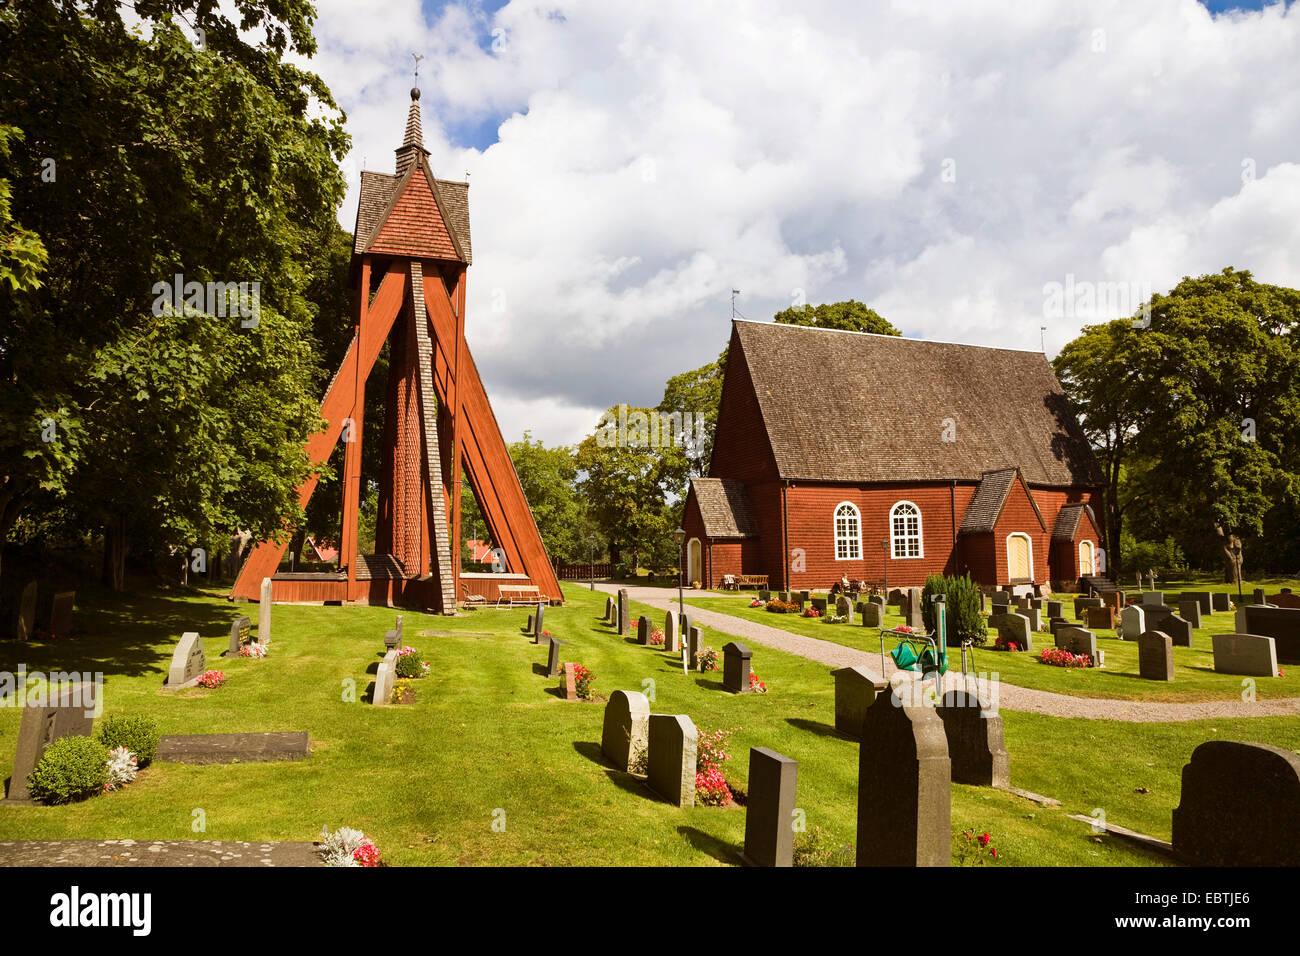 church and cemetery, Sweden, Sm�land, Kraksmala - Stock Image